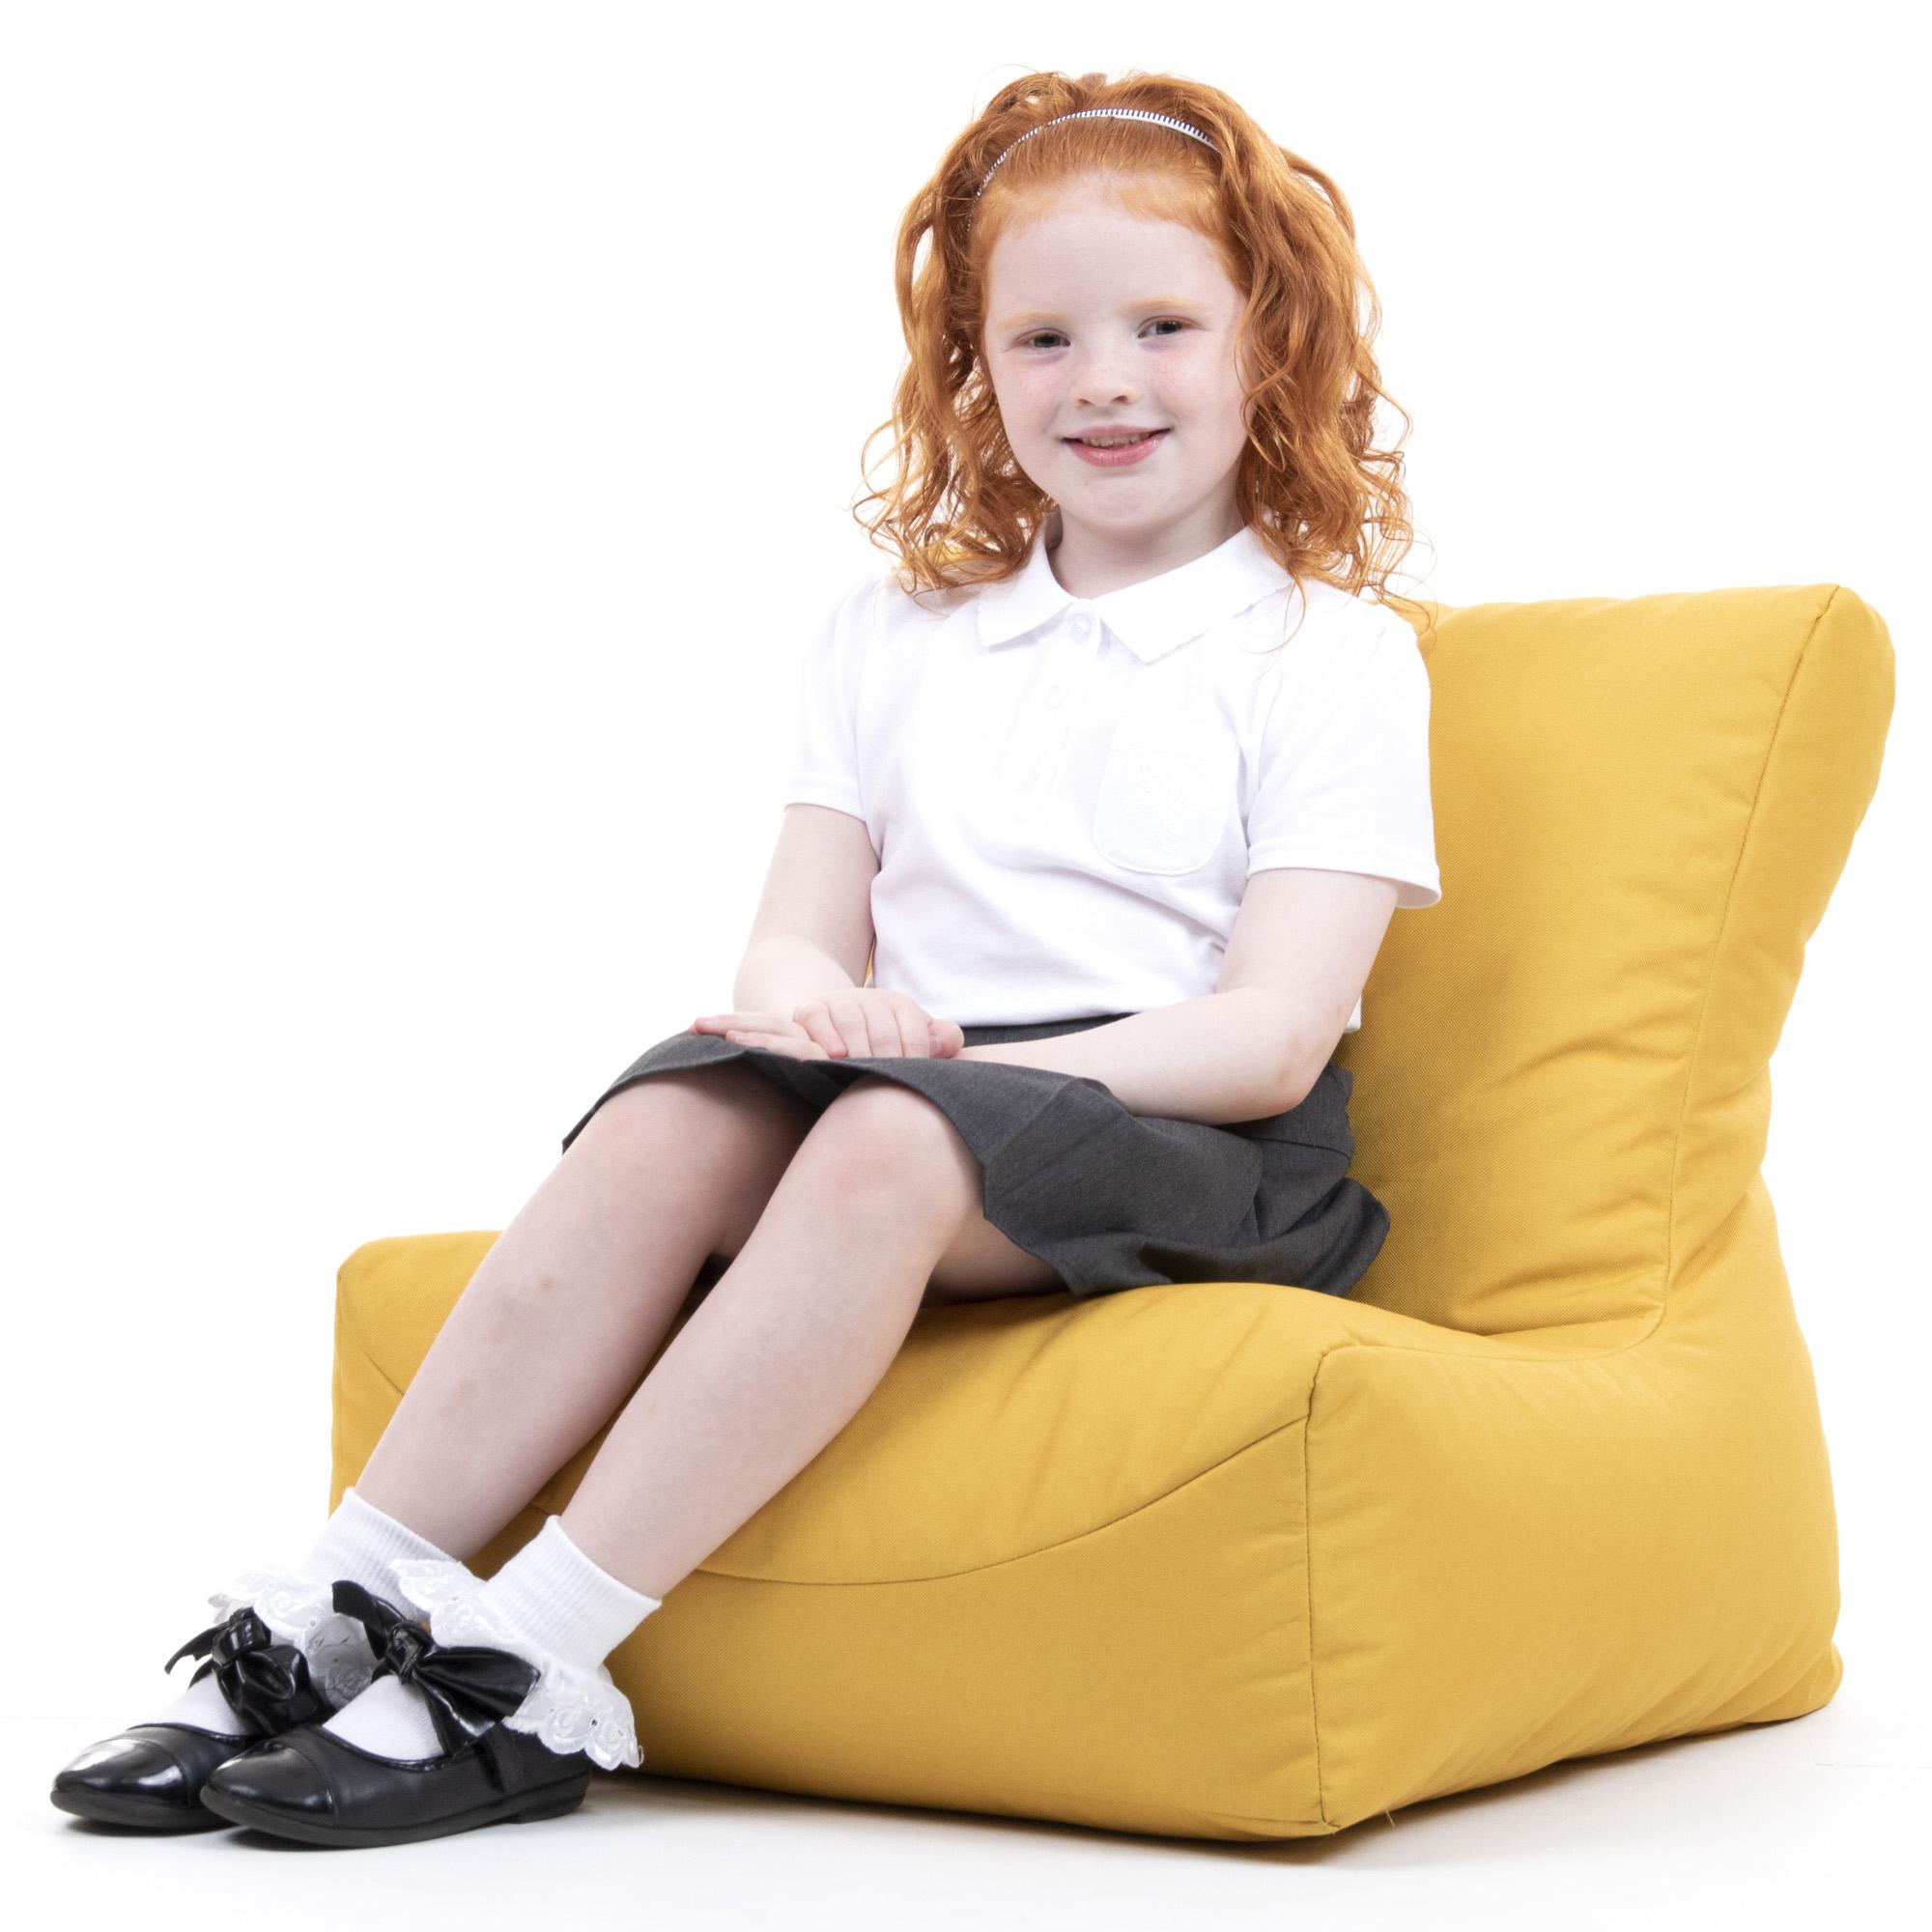 Eden-PRI-Smile-Chair-Mustard-3-300dpi